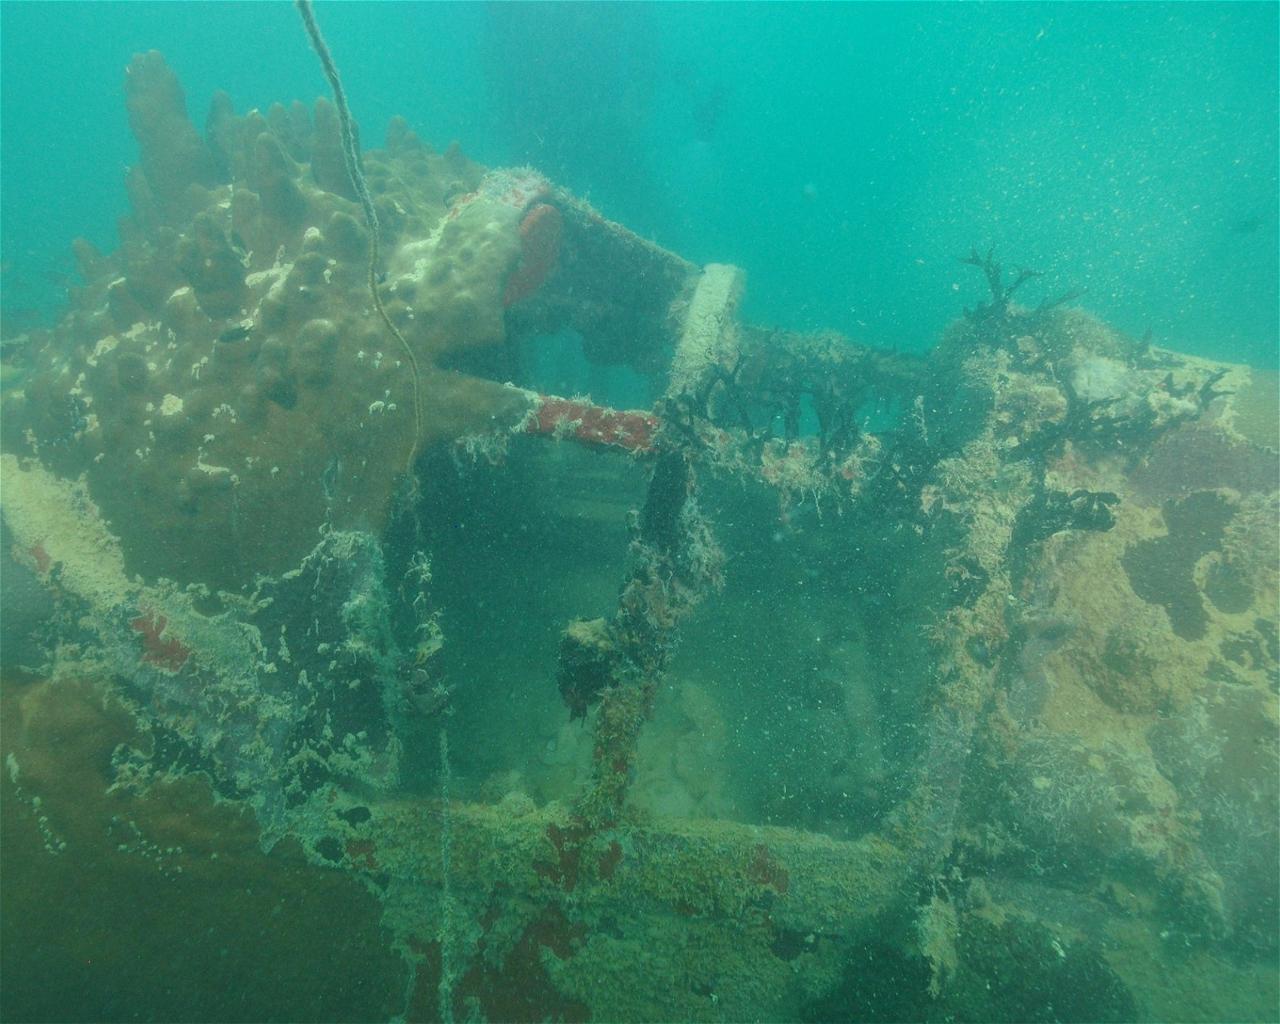 Vought F4U Corsair (Wreck)